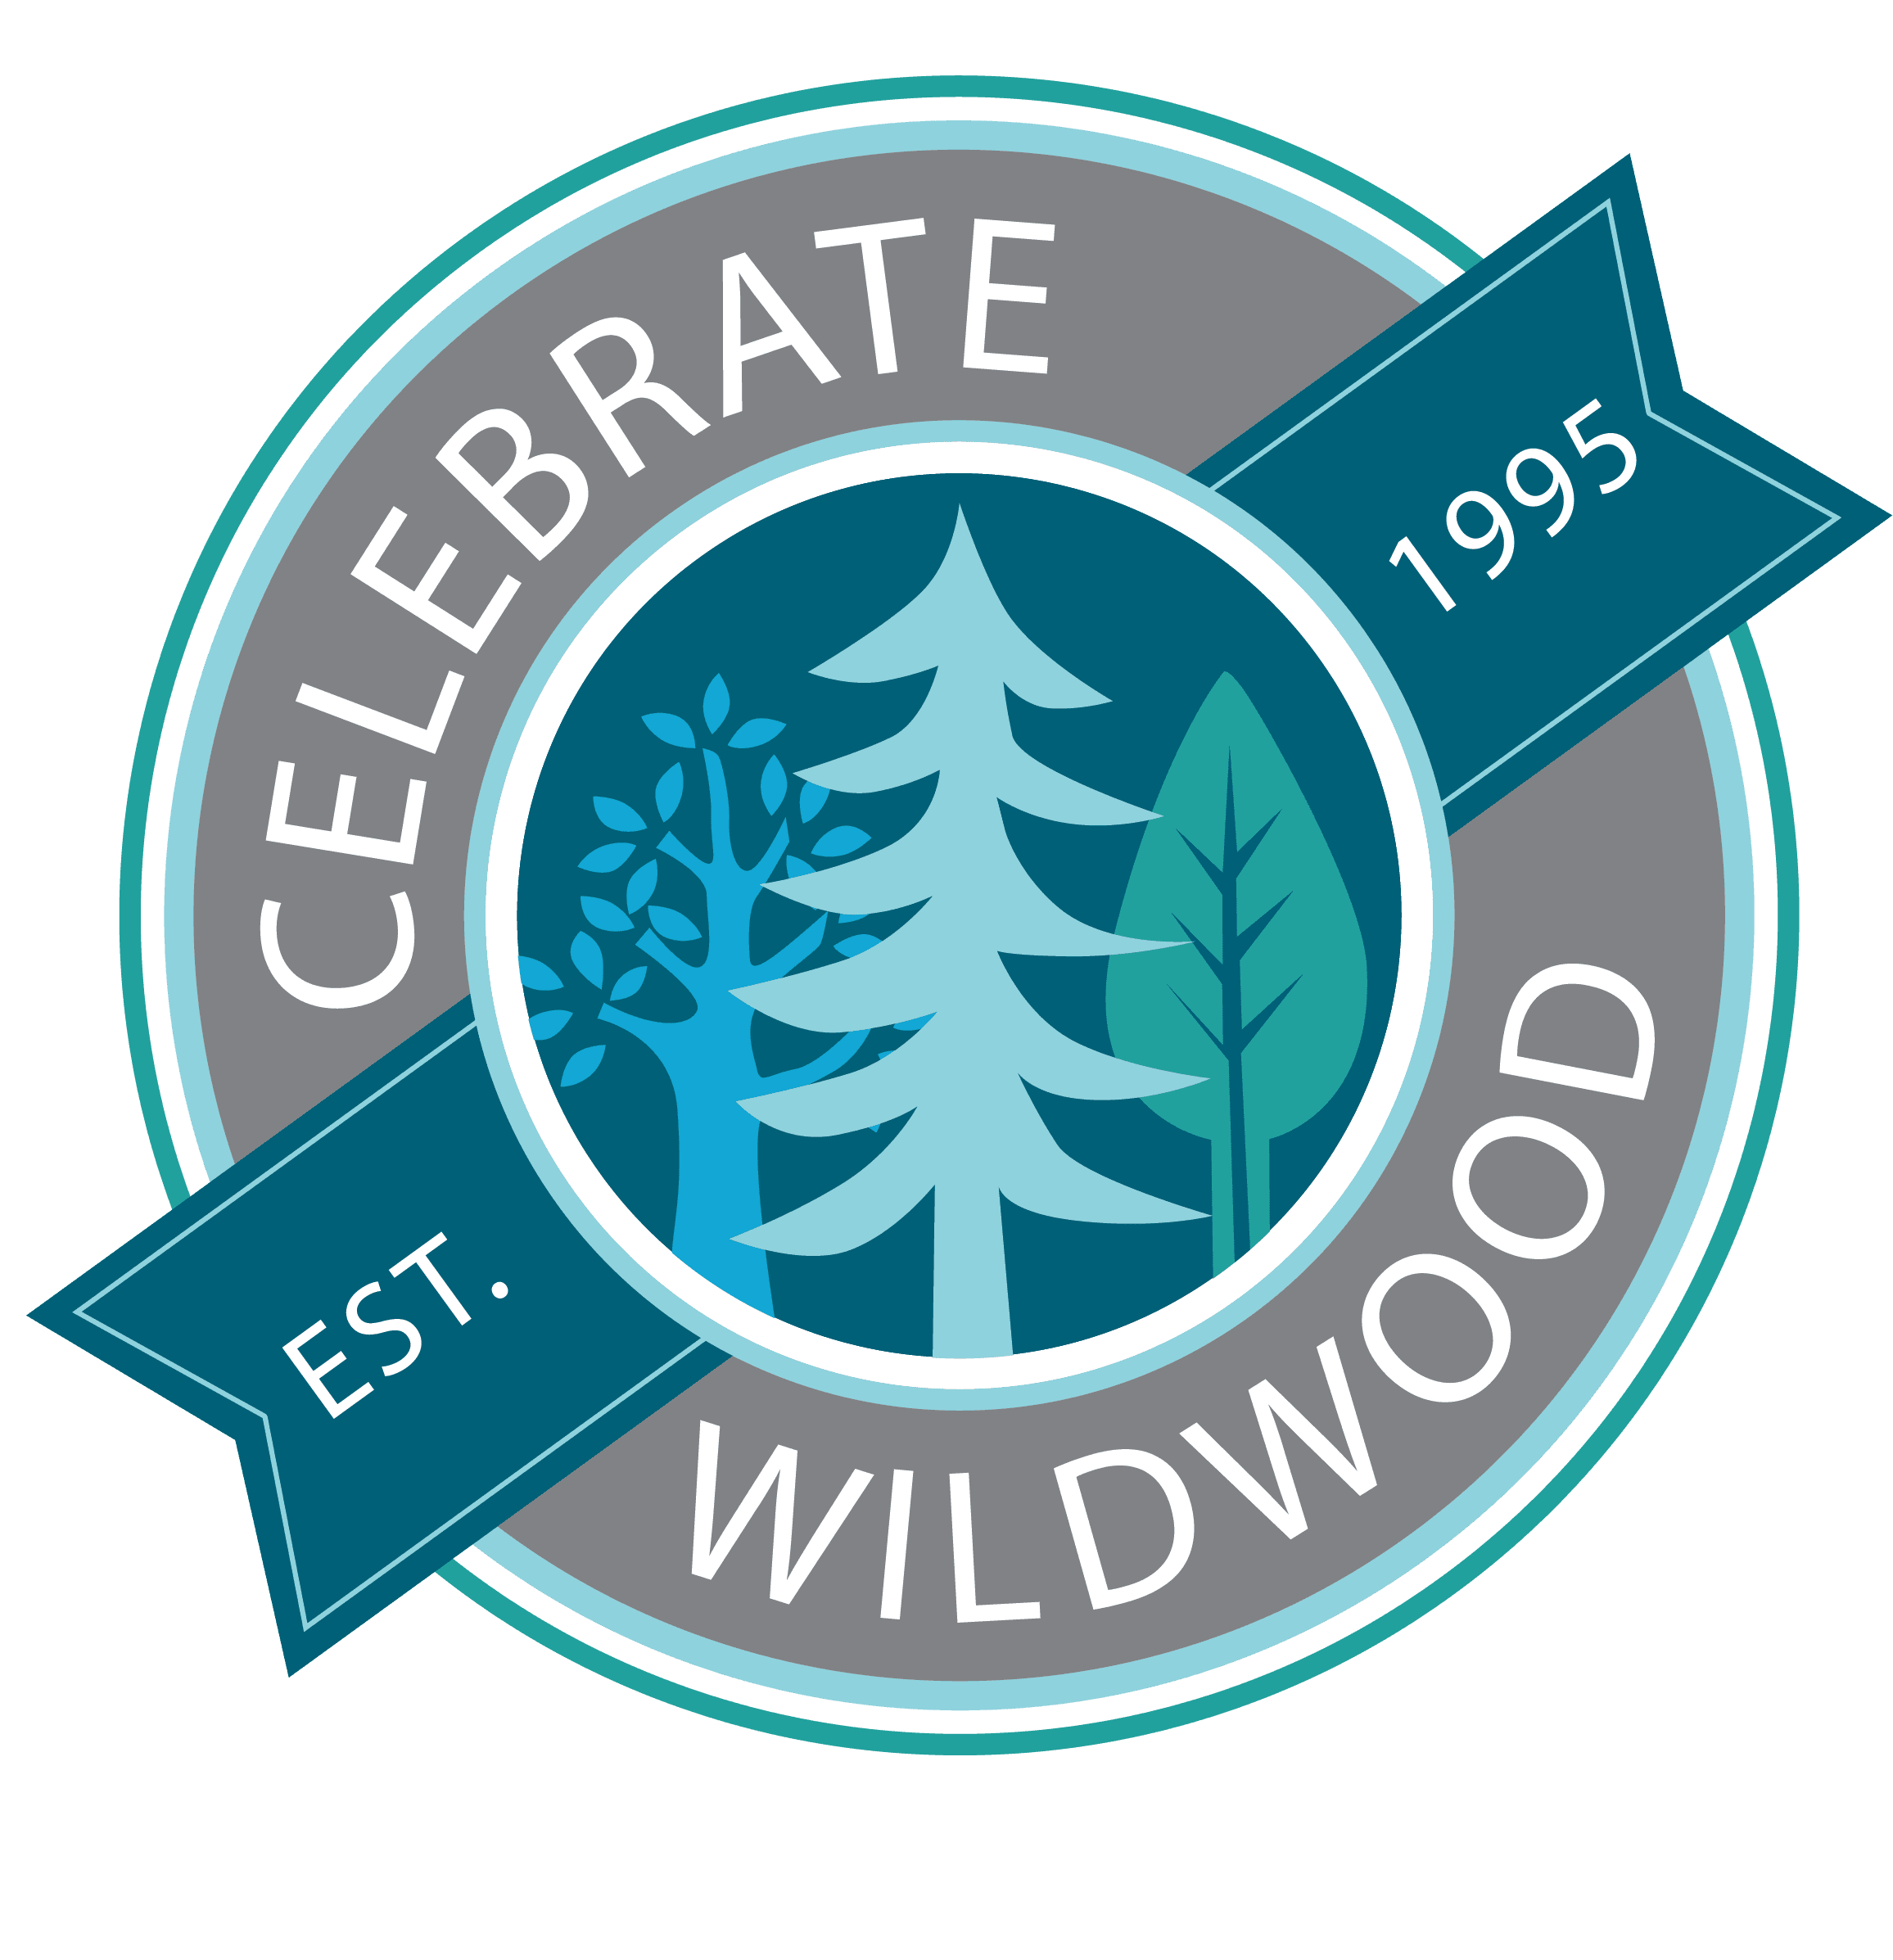 2021 Celebrate Wildwood